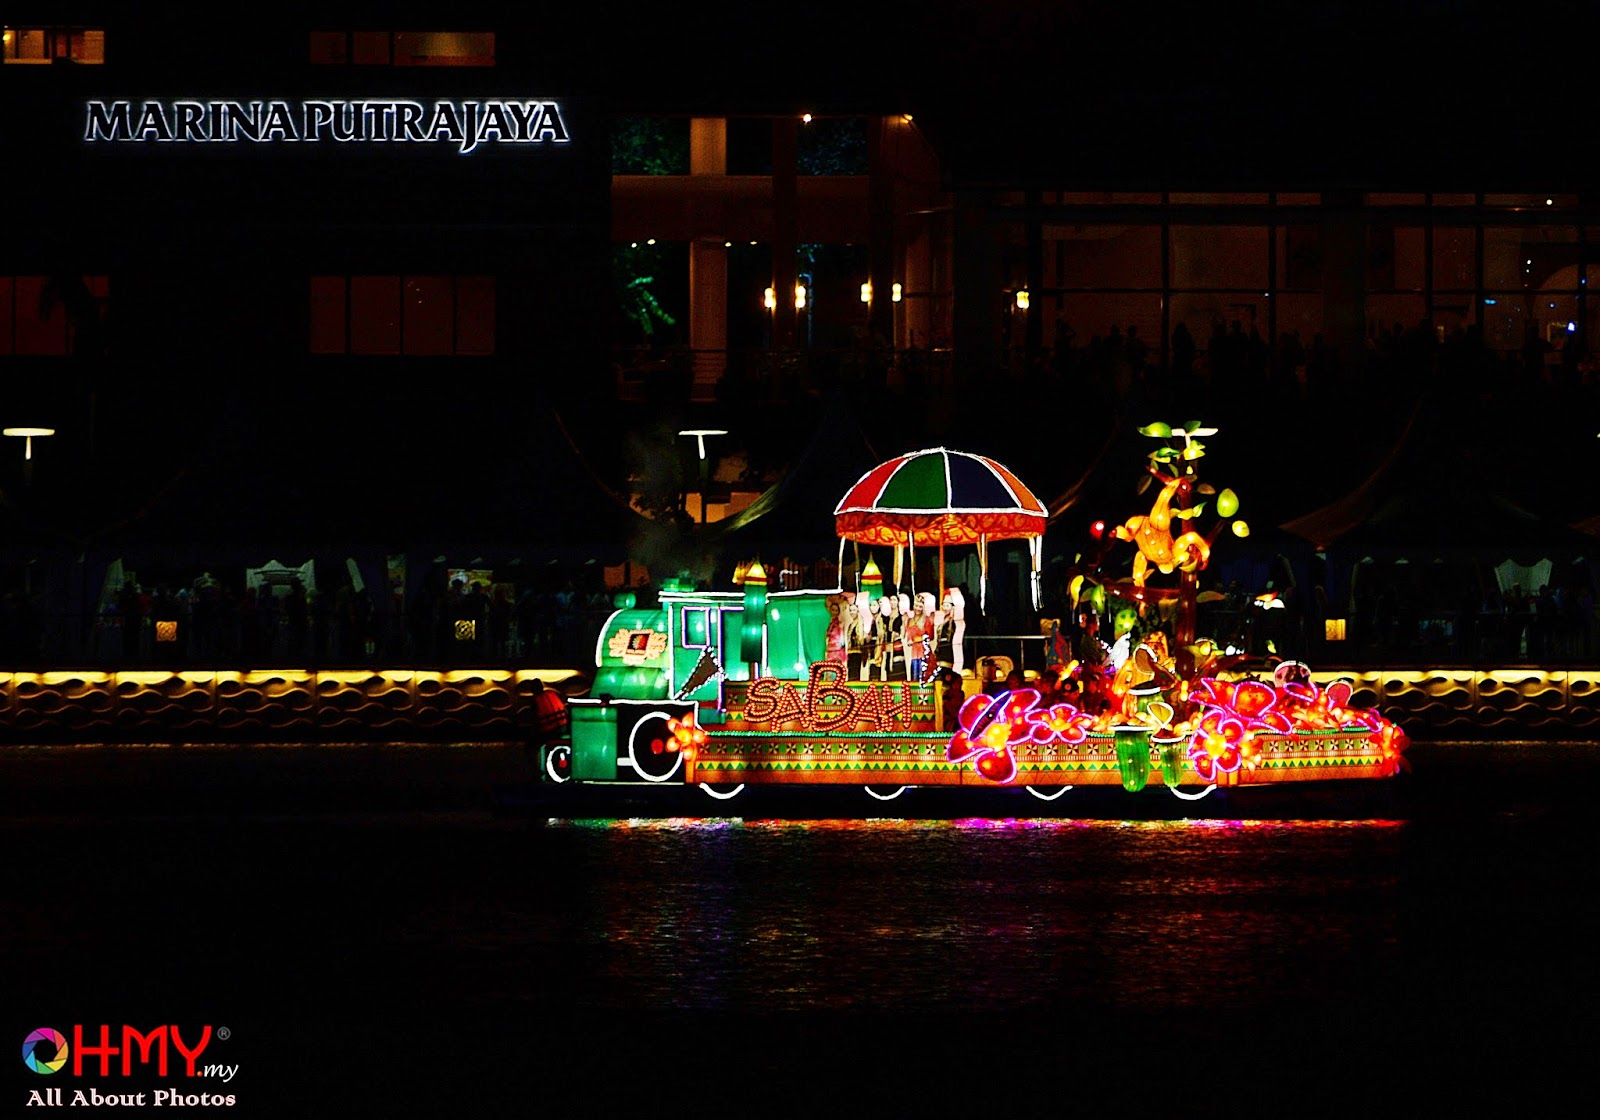 Warna Wani Magic Of The Night | Floria Putrajaya 2014